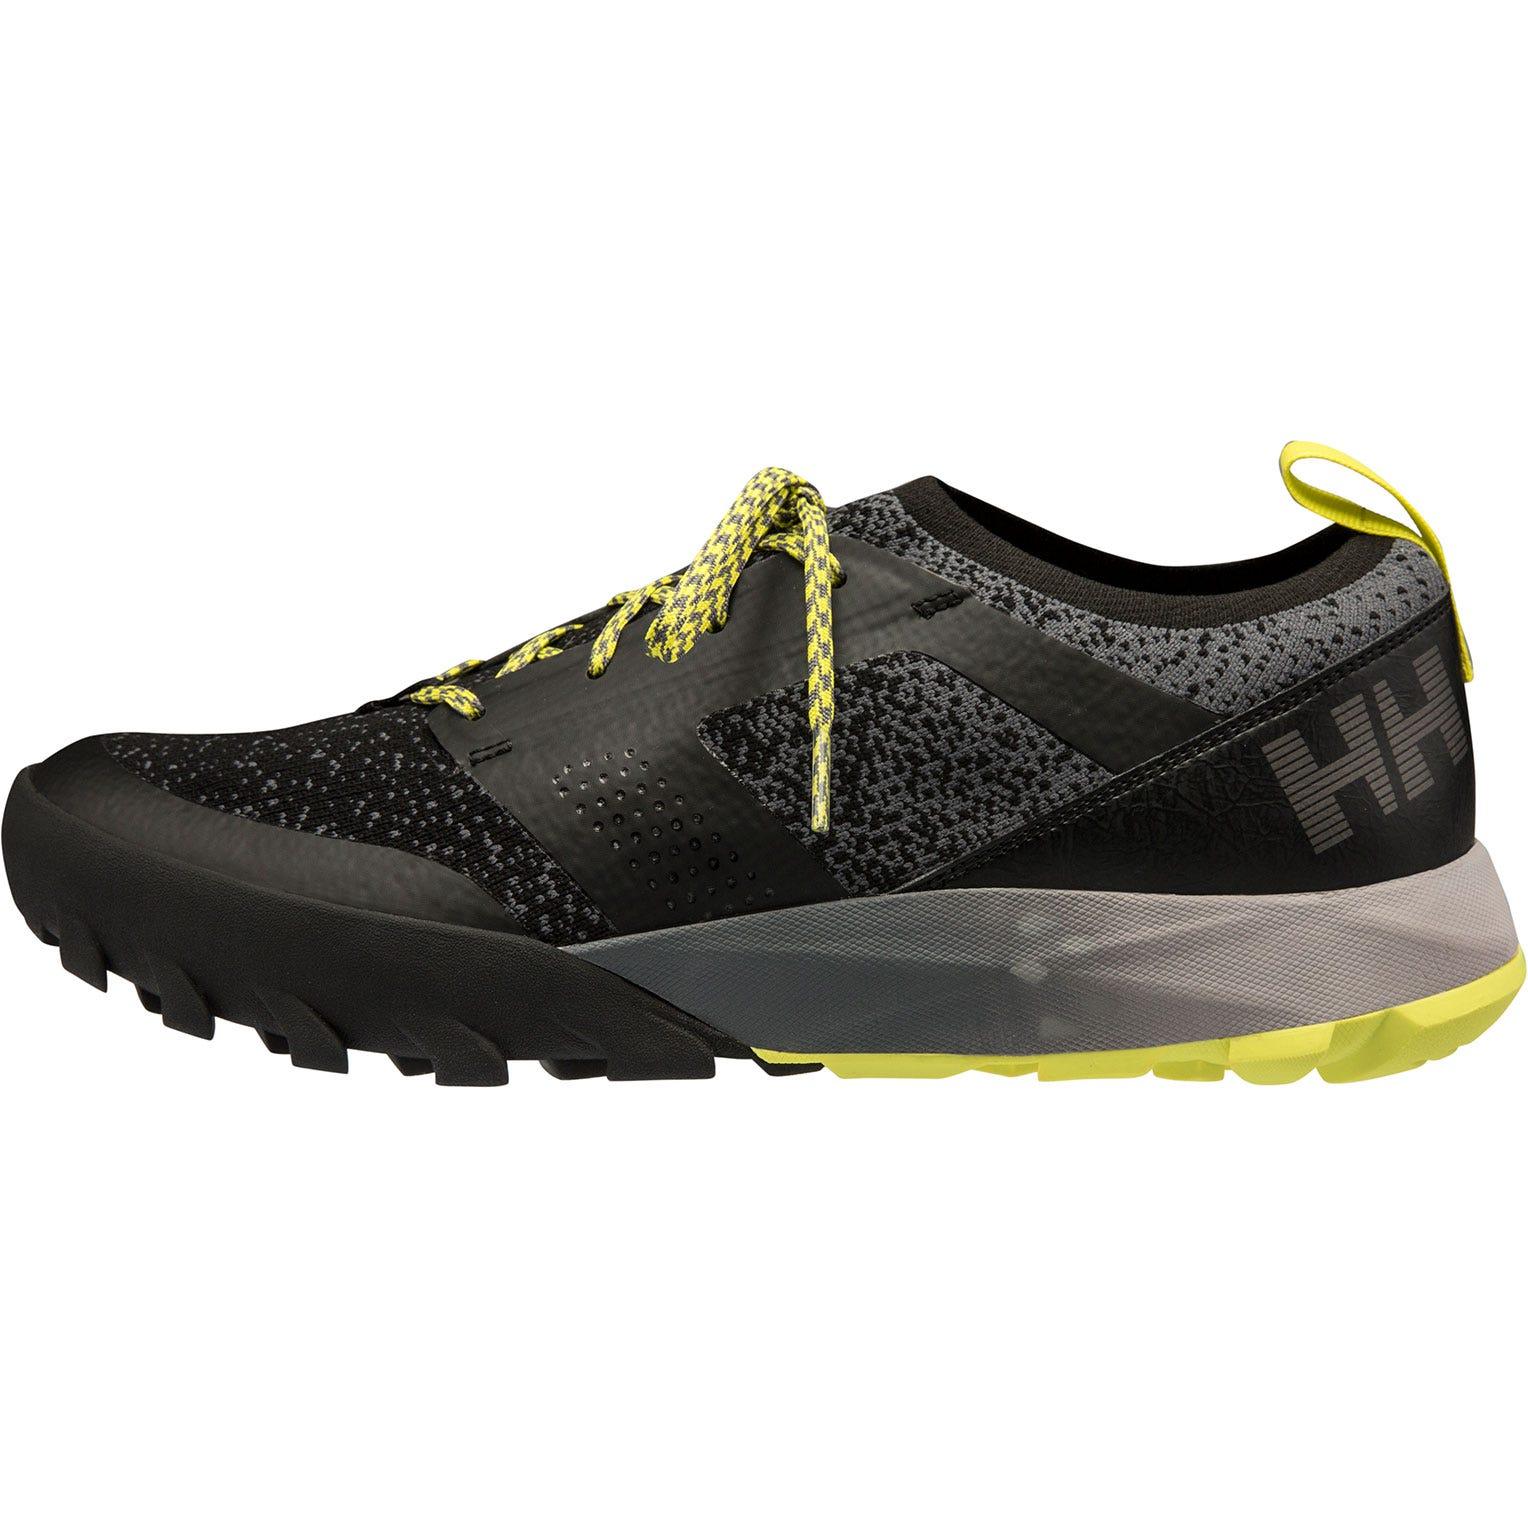 Helly Hansen Loke Dash Mens Hiking Boot Black 41/8